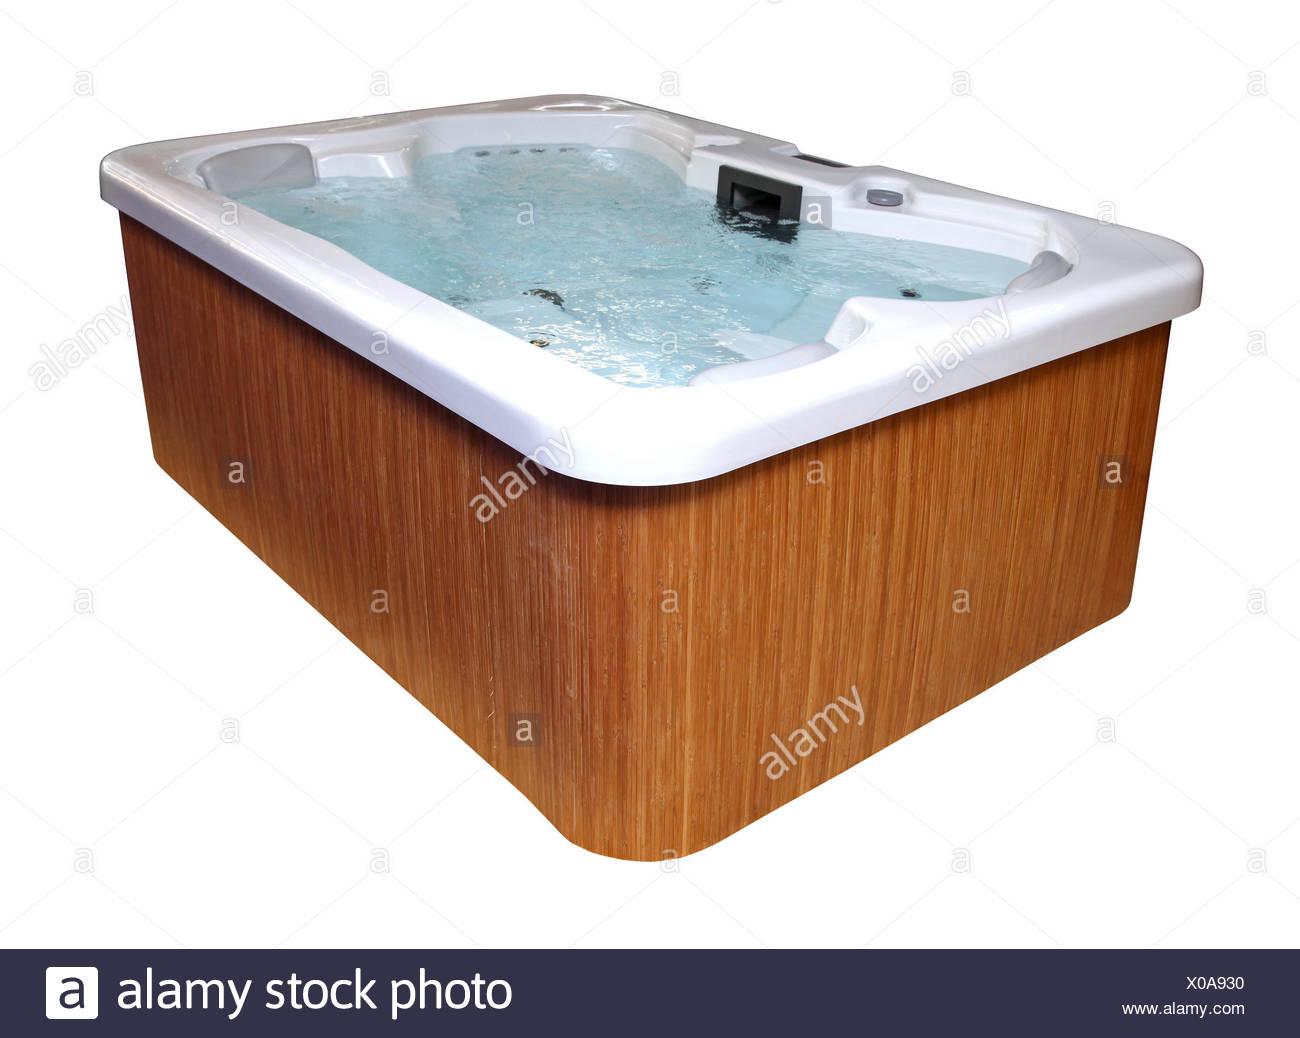 Vasca Da Bagno In Legno : Vasca bagno legno vasche da bagno in legno